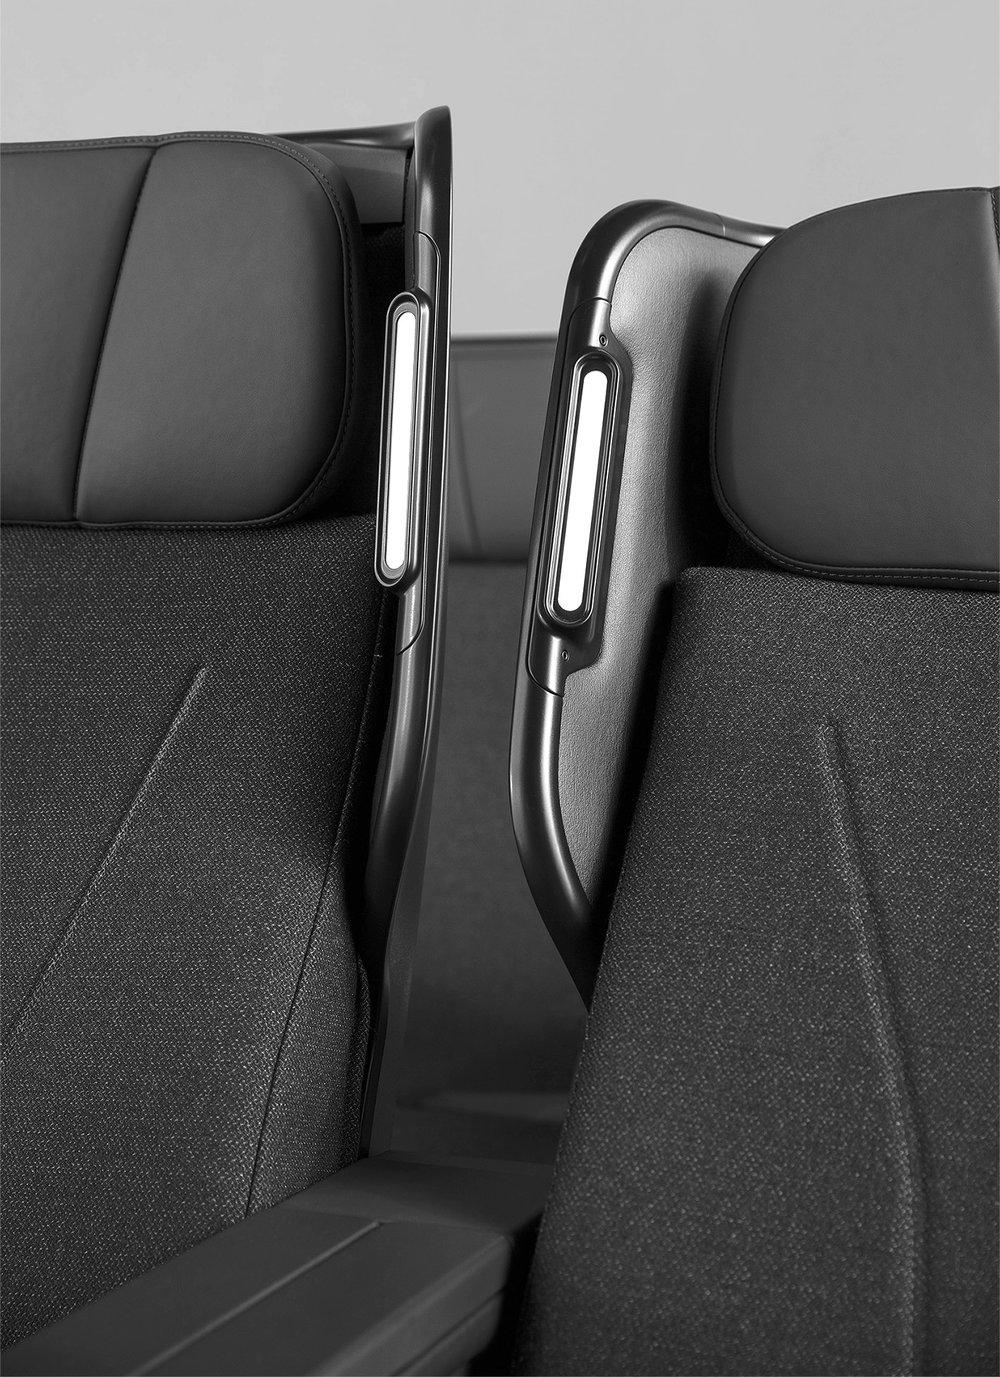 Caon_QF+Seats_0A8A7699_RT_DE_B+W.jpg